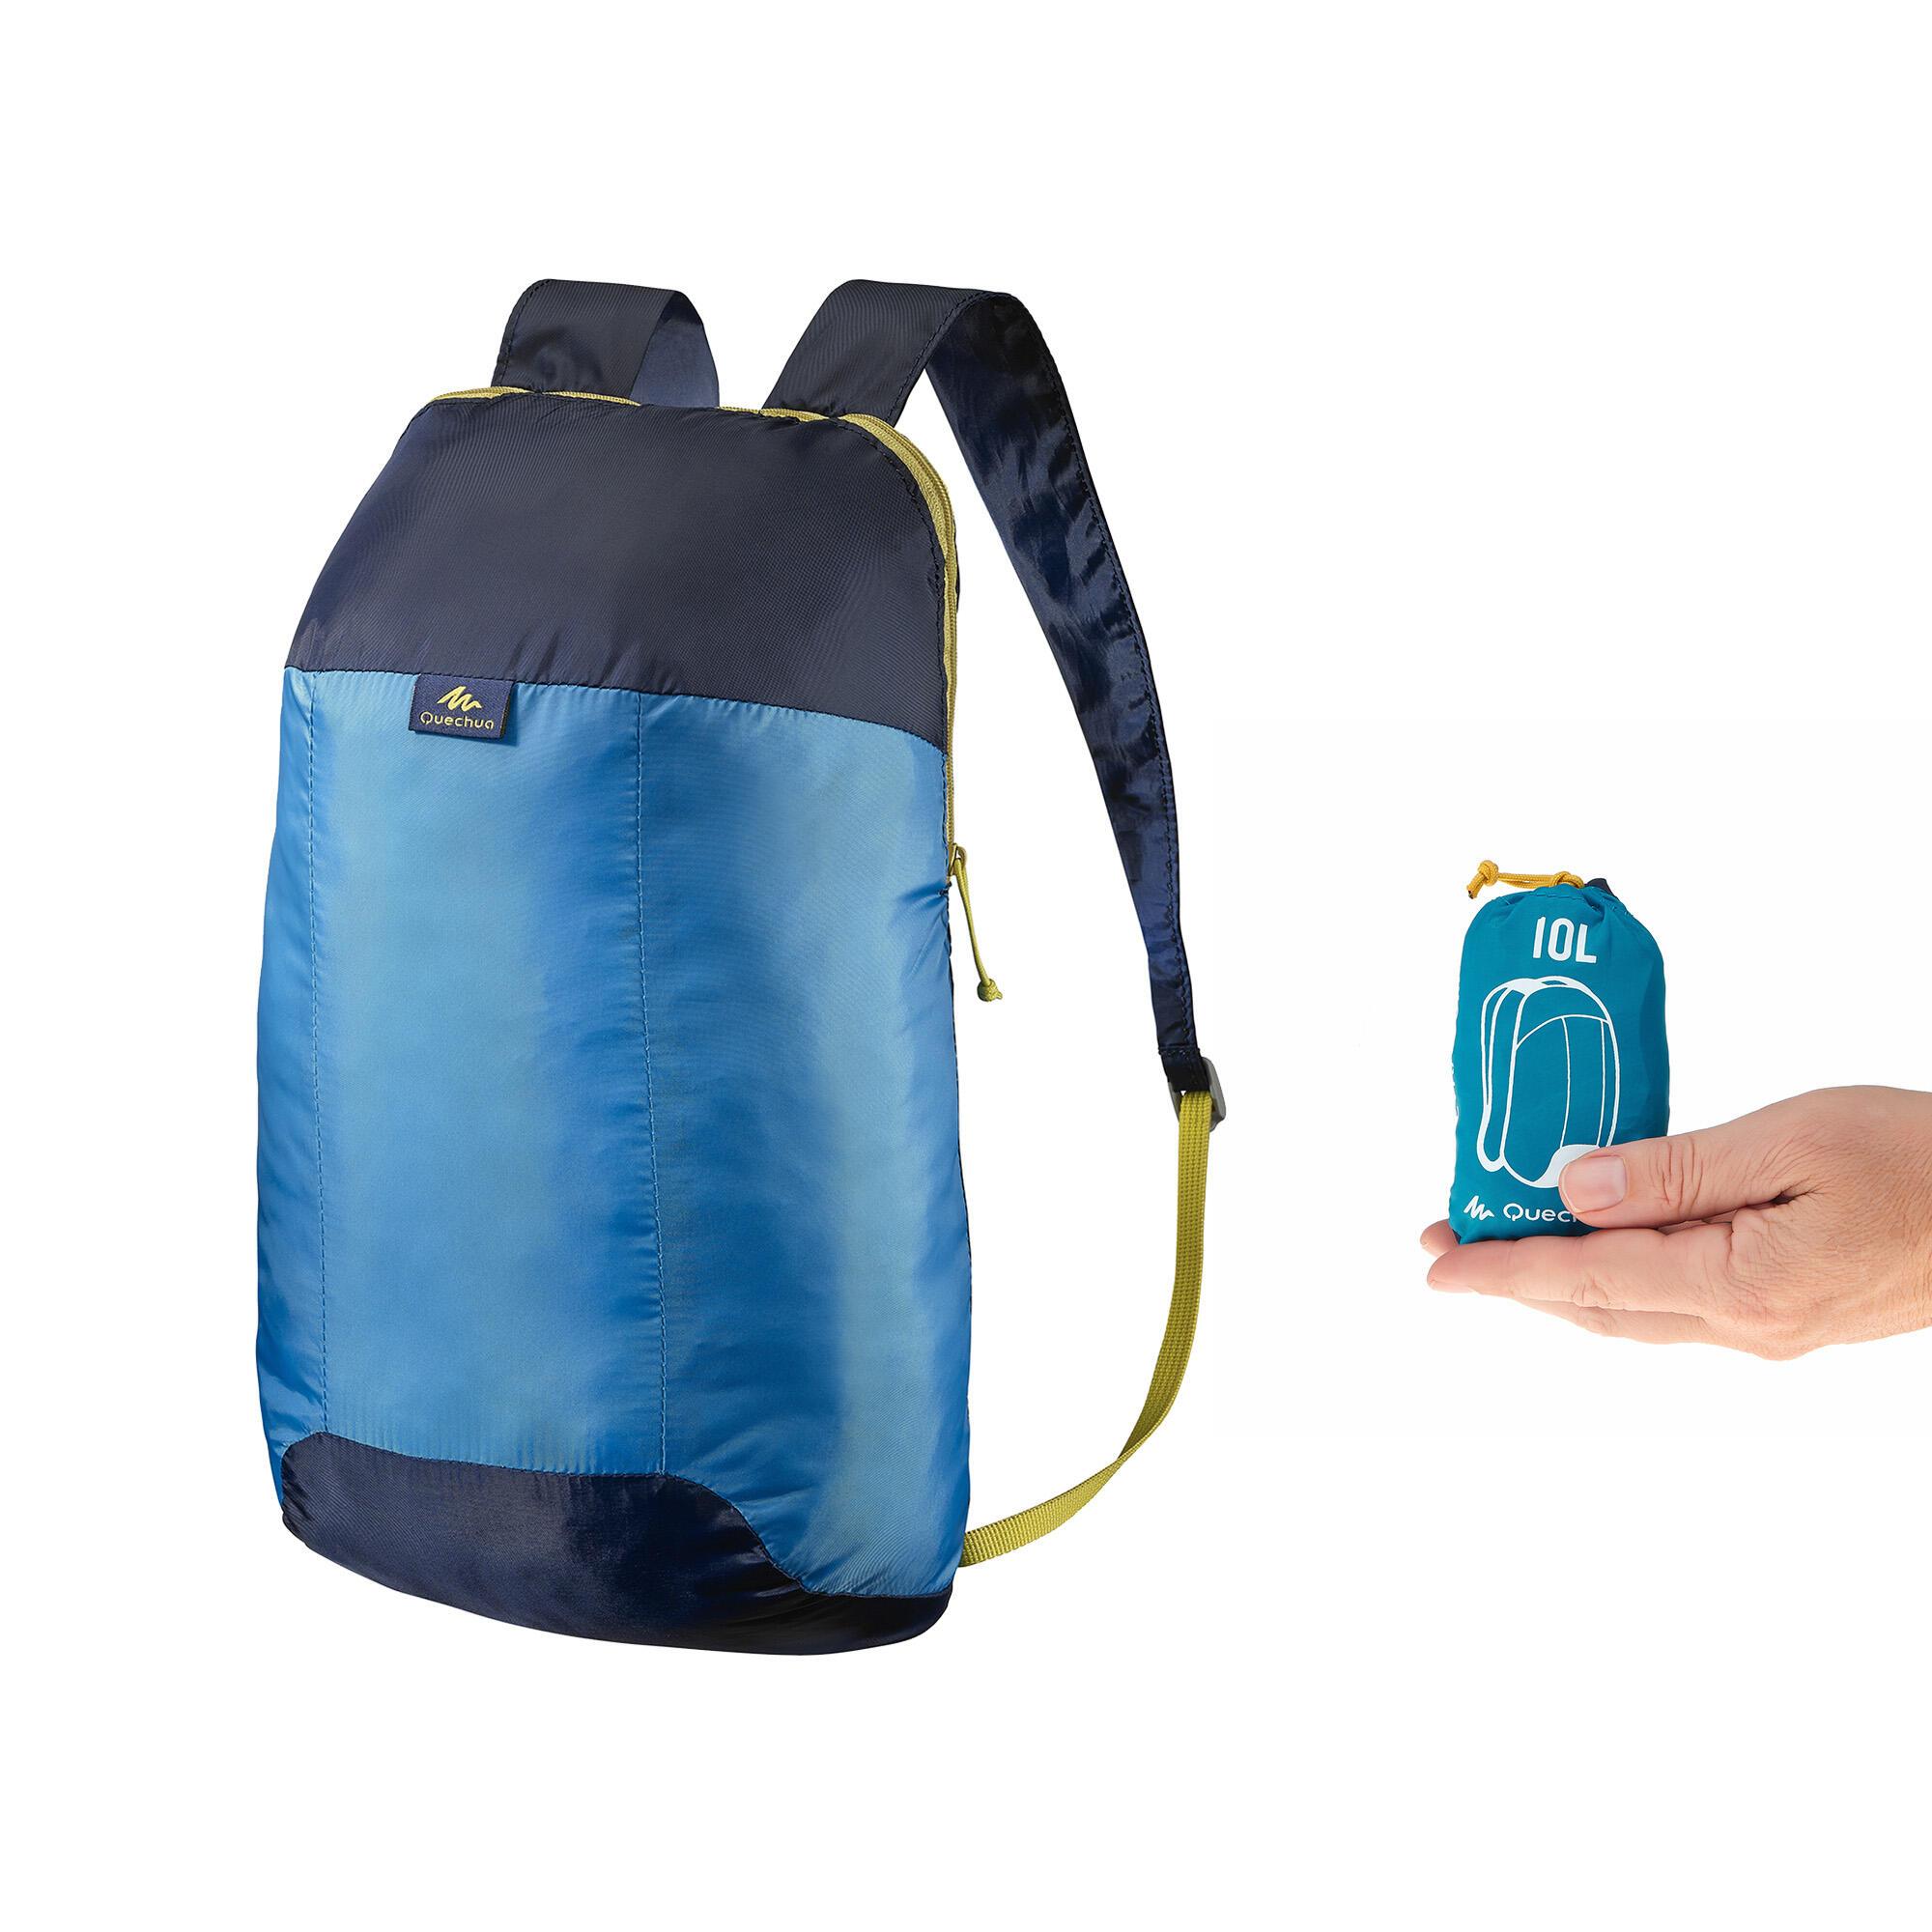 Mochila Arpenaz 10 ultra compacta y ultra ligera azul